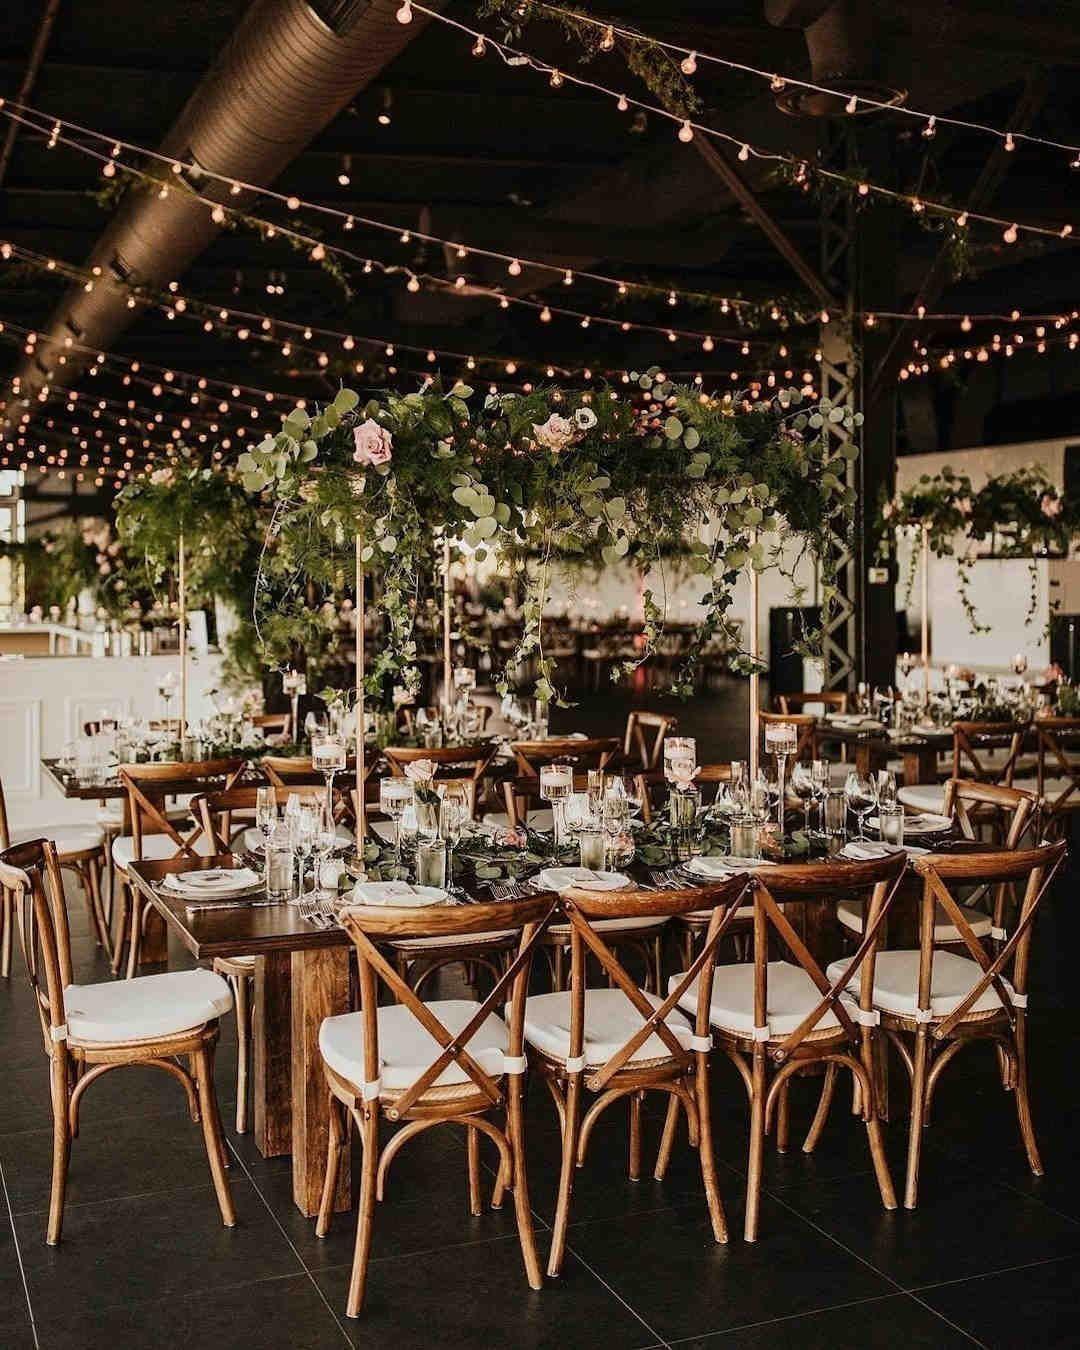 Vintage And Elegant Wedding Decoration Ideas Garden Wedding Outdoor Wedding Wedding Wedding Aisle Decorations Wedding Decor Elegant Wedding Hall Decorations